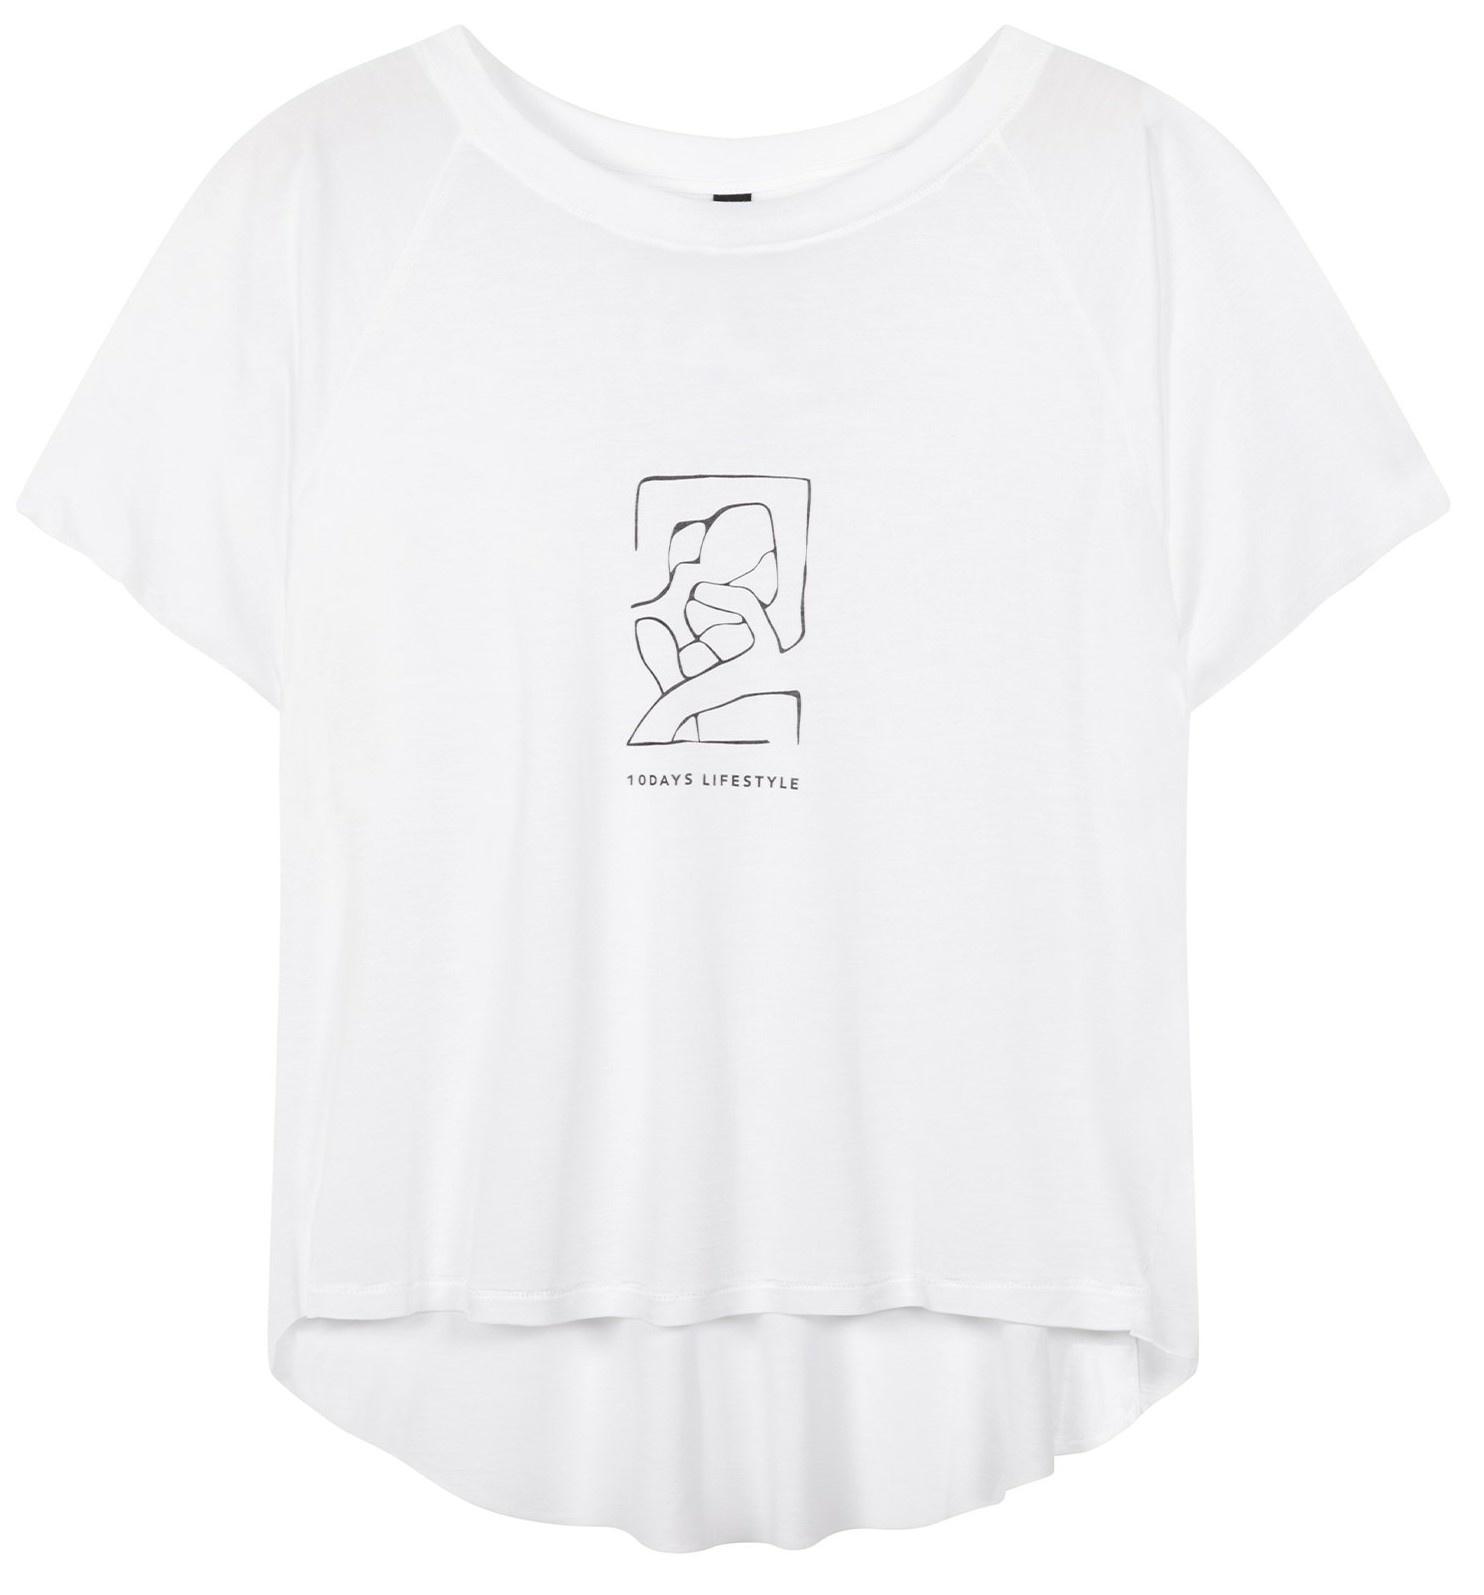 T-shirt shortsleeve tee sketch white-2